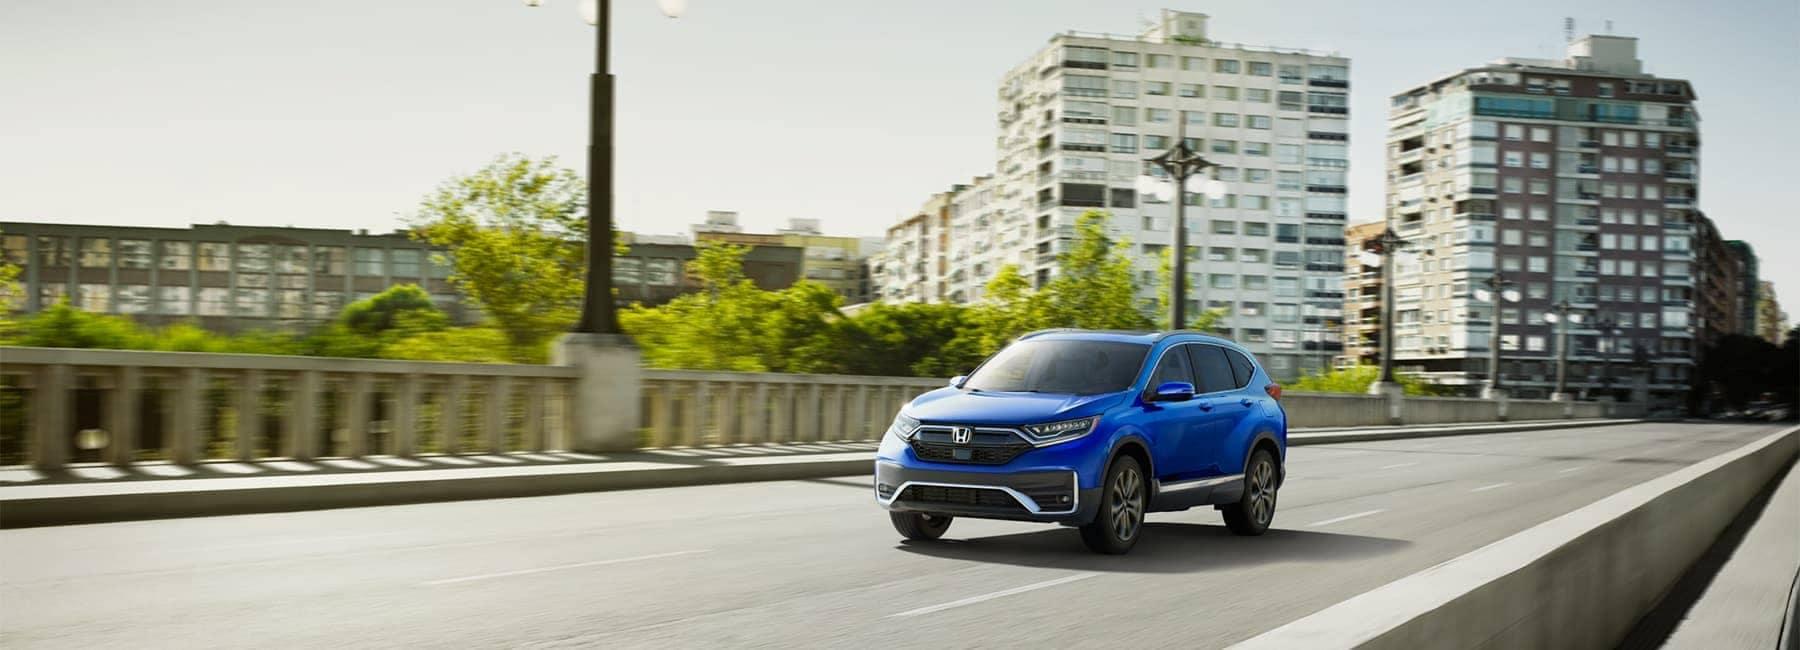 2020 Blue Honda CR-V driving down a two lane road